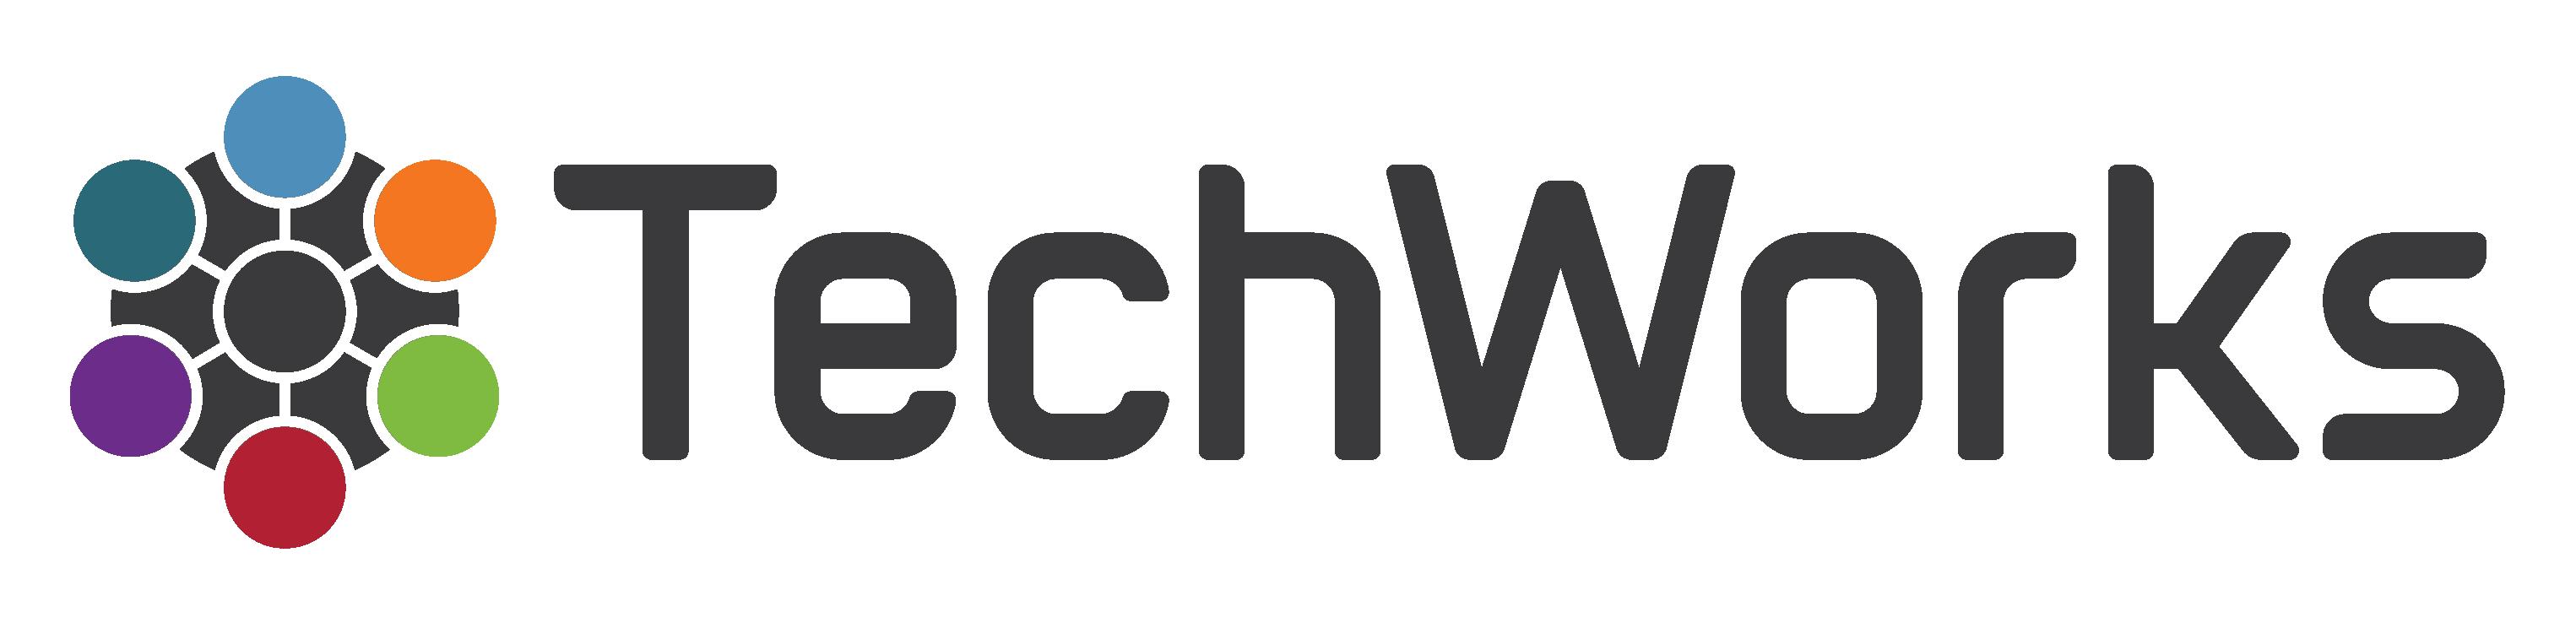 TechWorks_logo.png